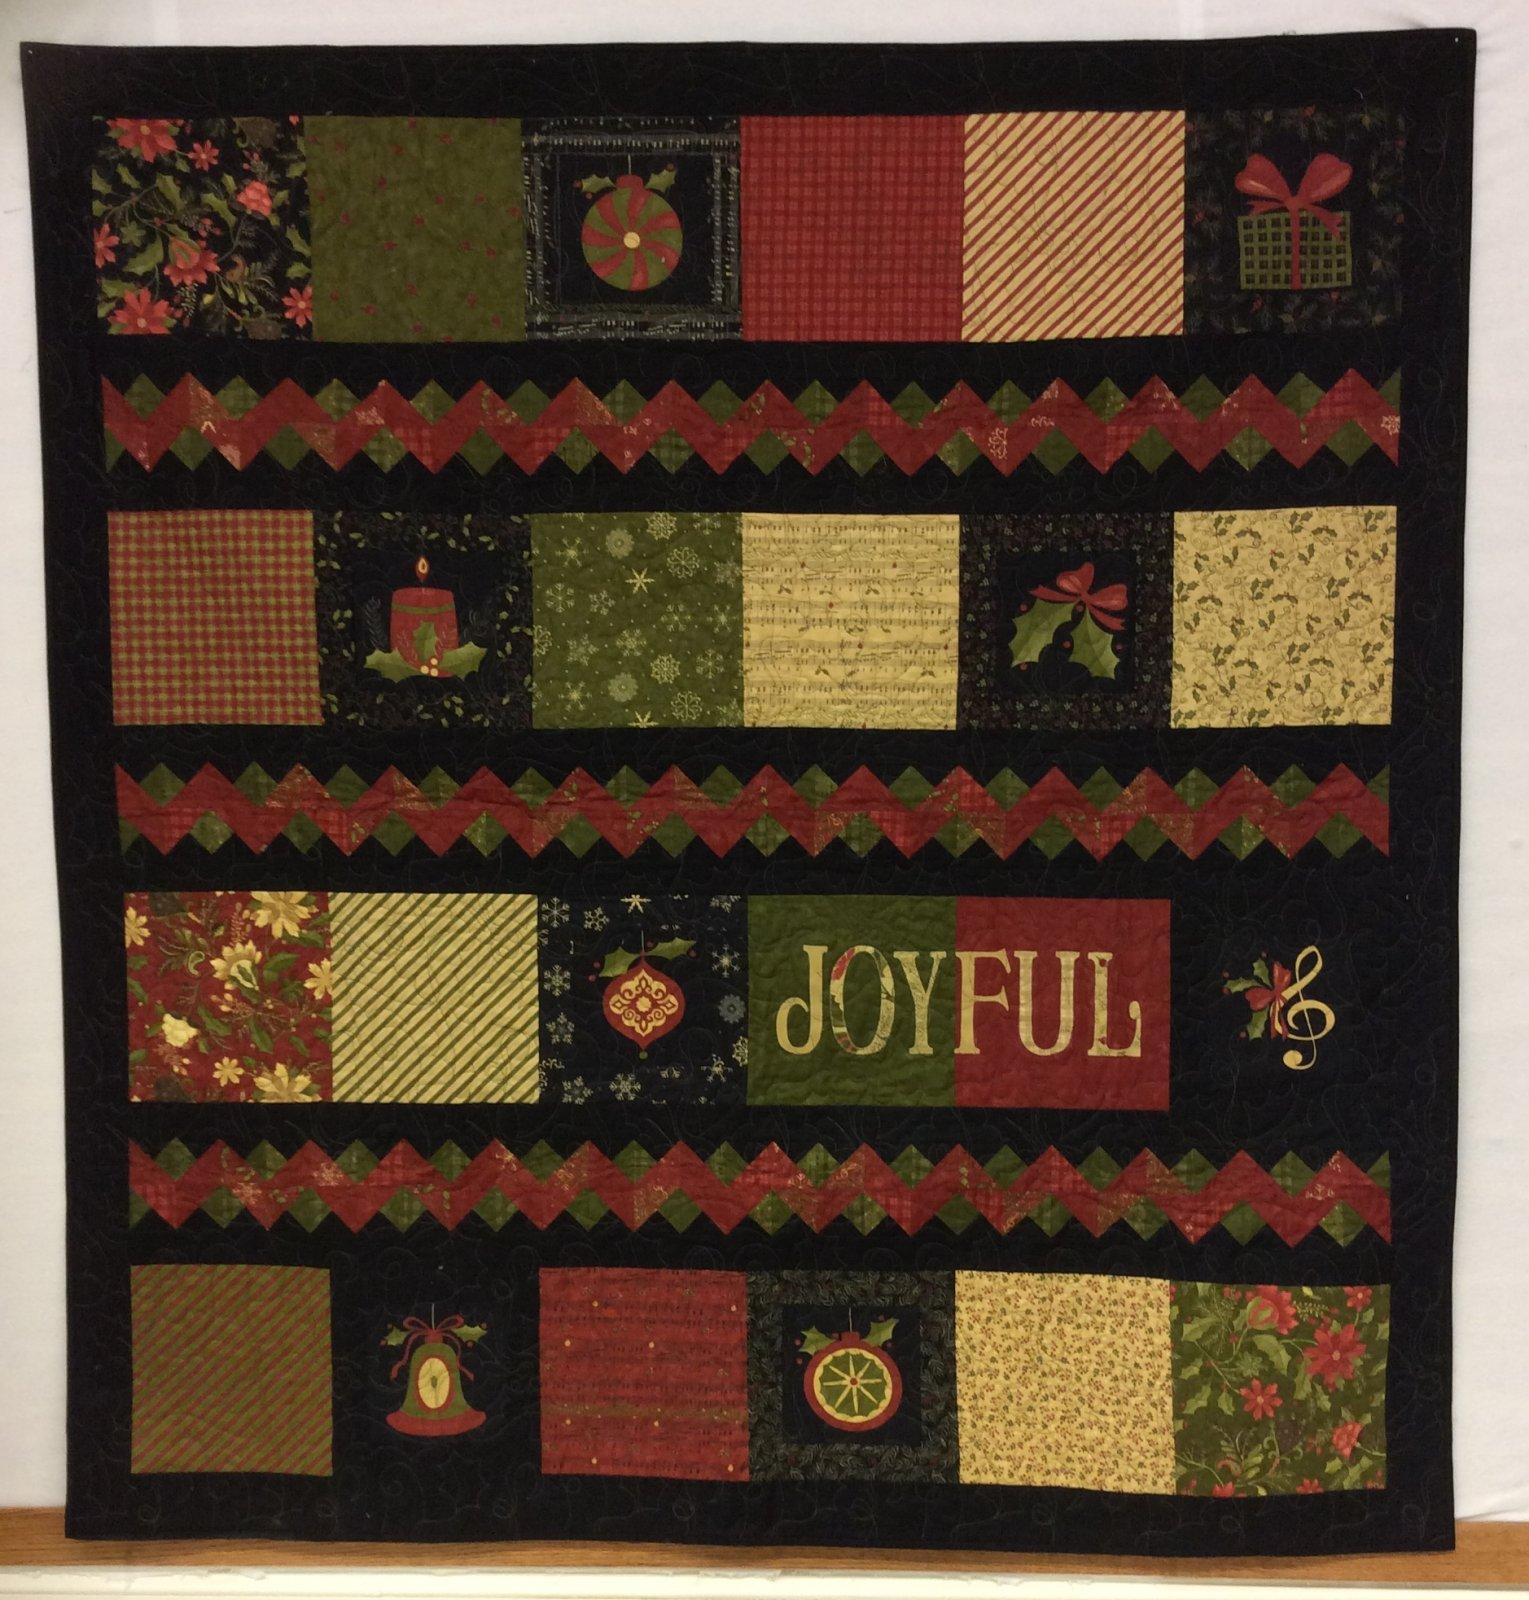 Delightful December Motif Quilt -PGK